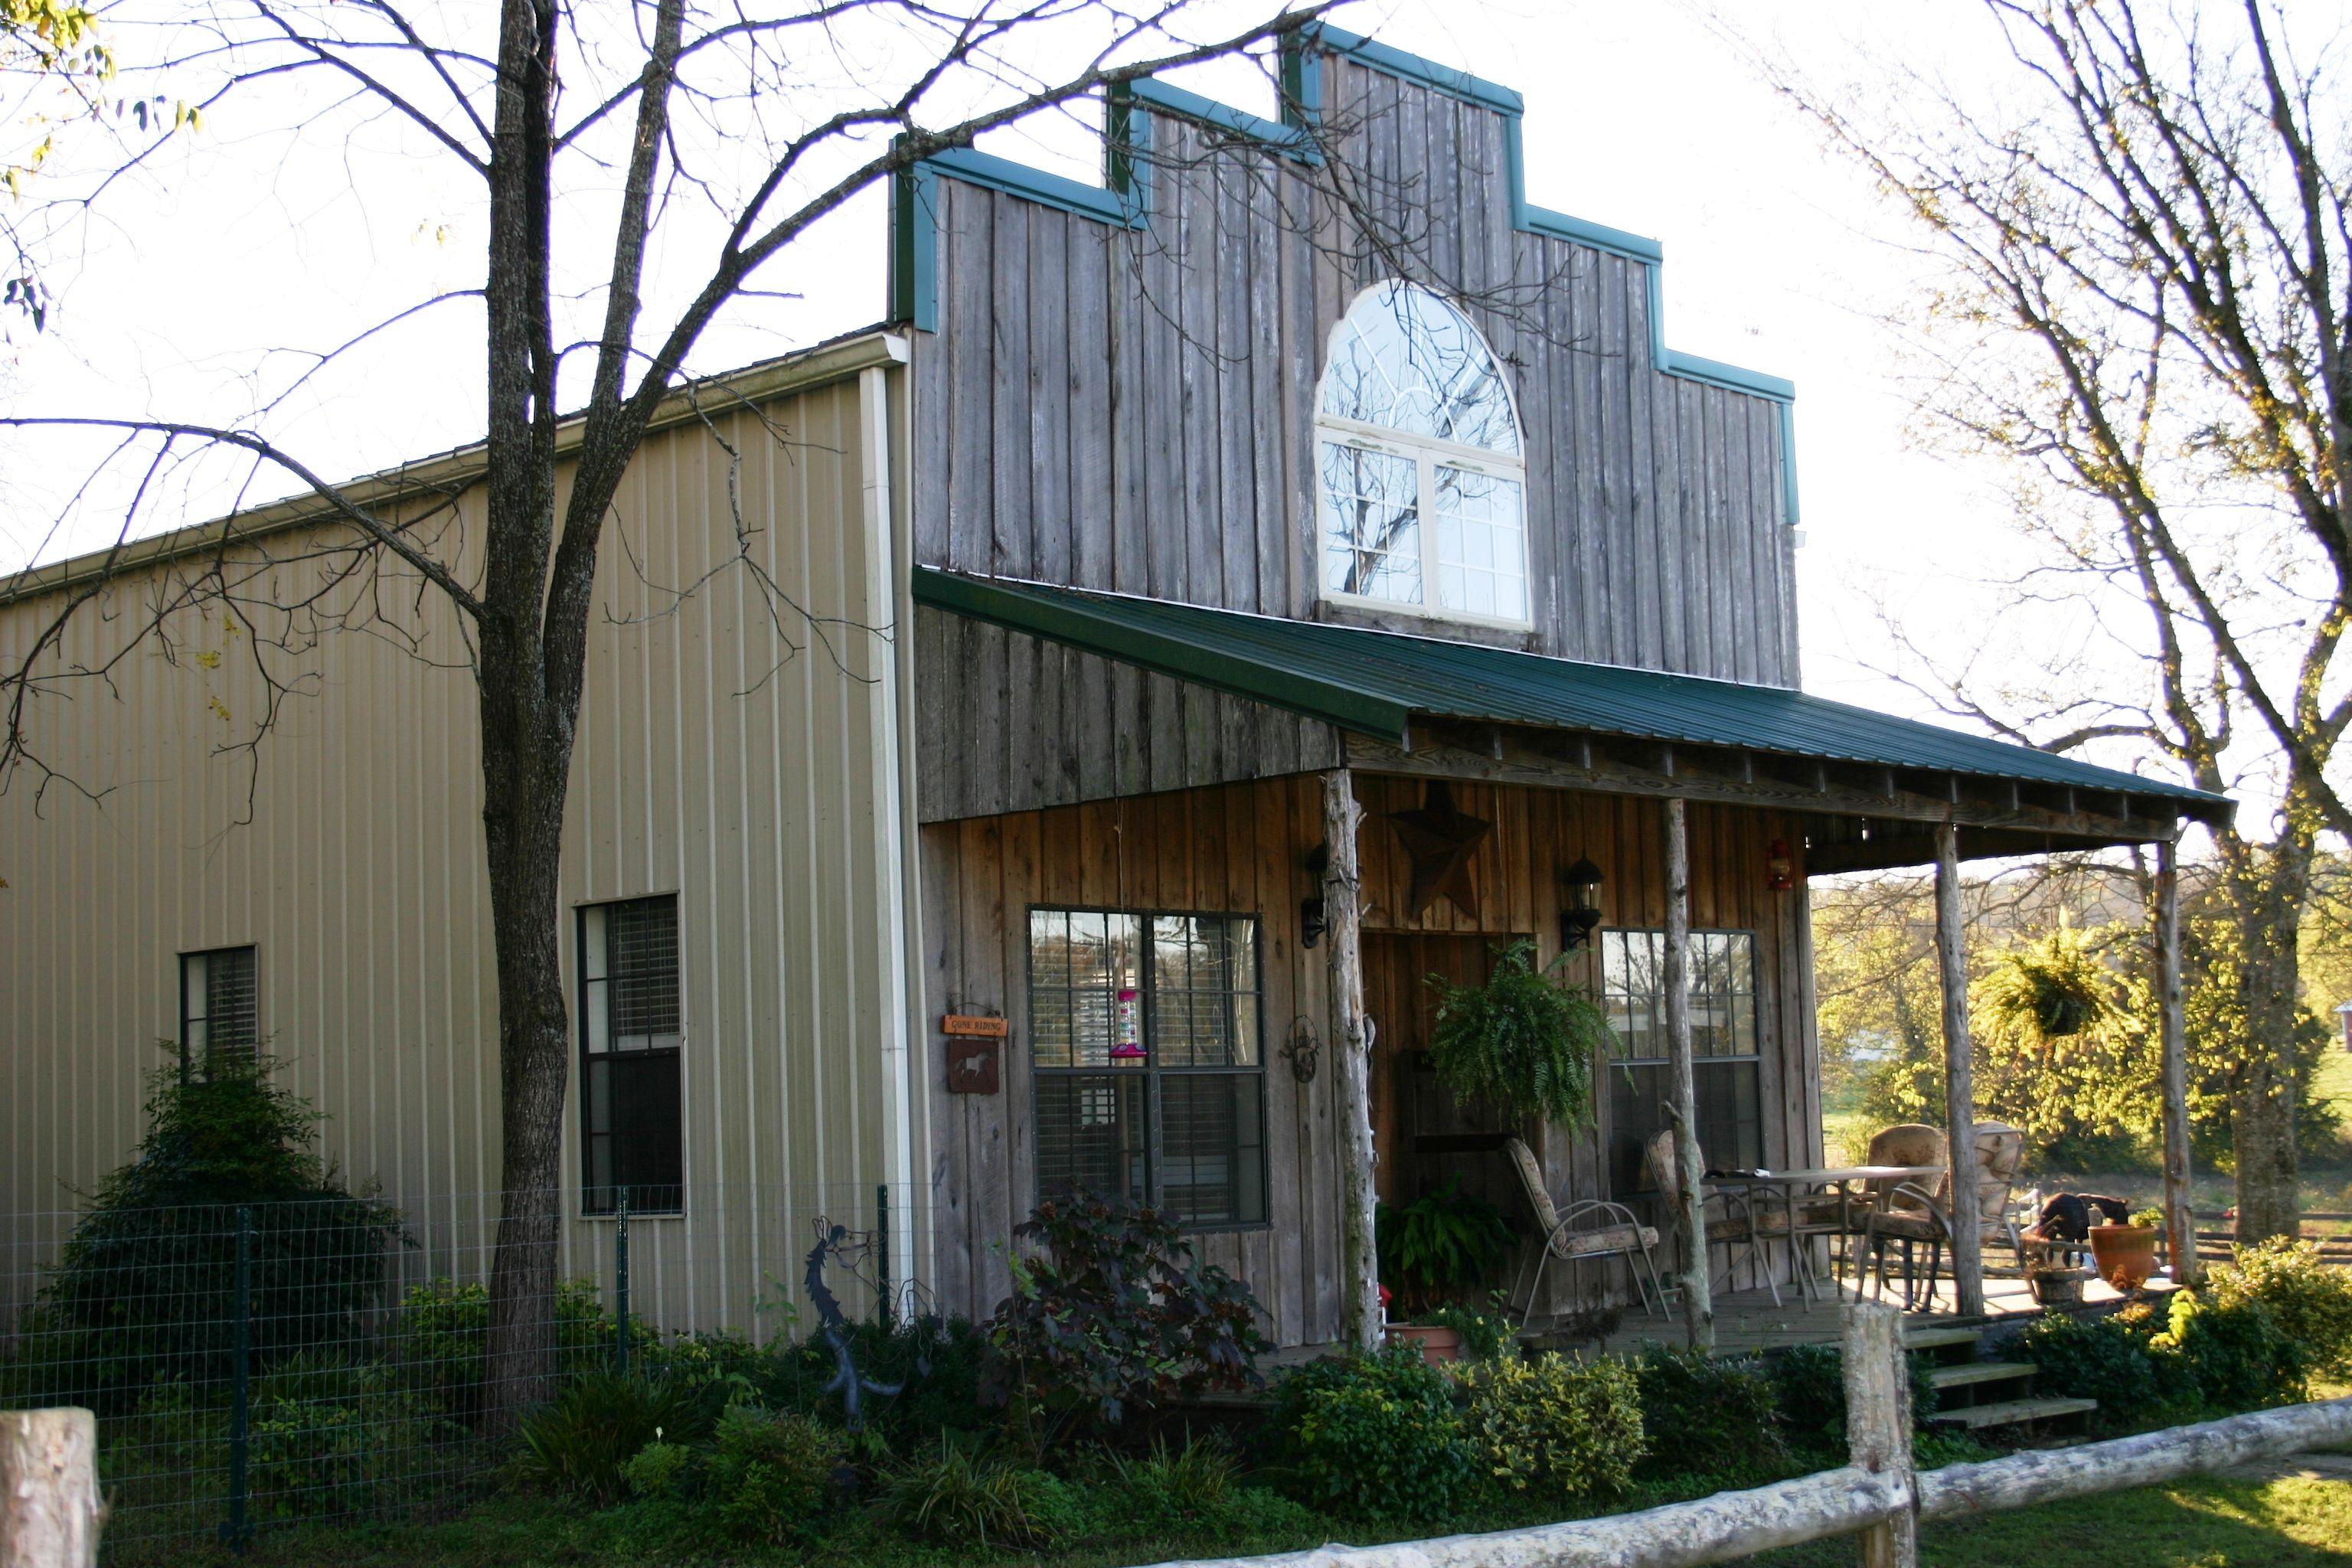 Horse barn apartment!~ | Horse barns | Pinterest | Horse barns, Barn ...